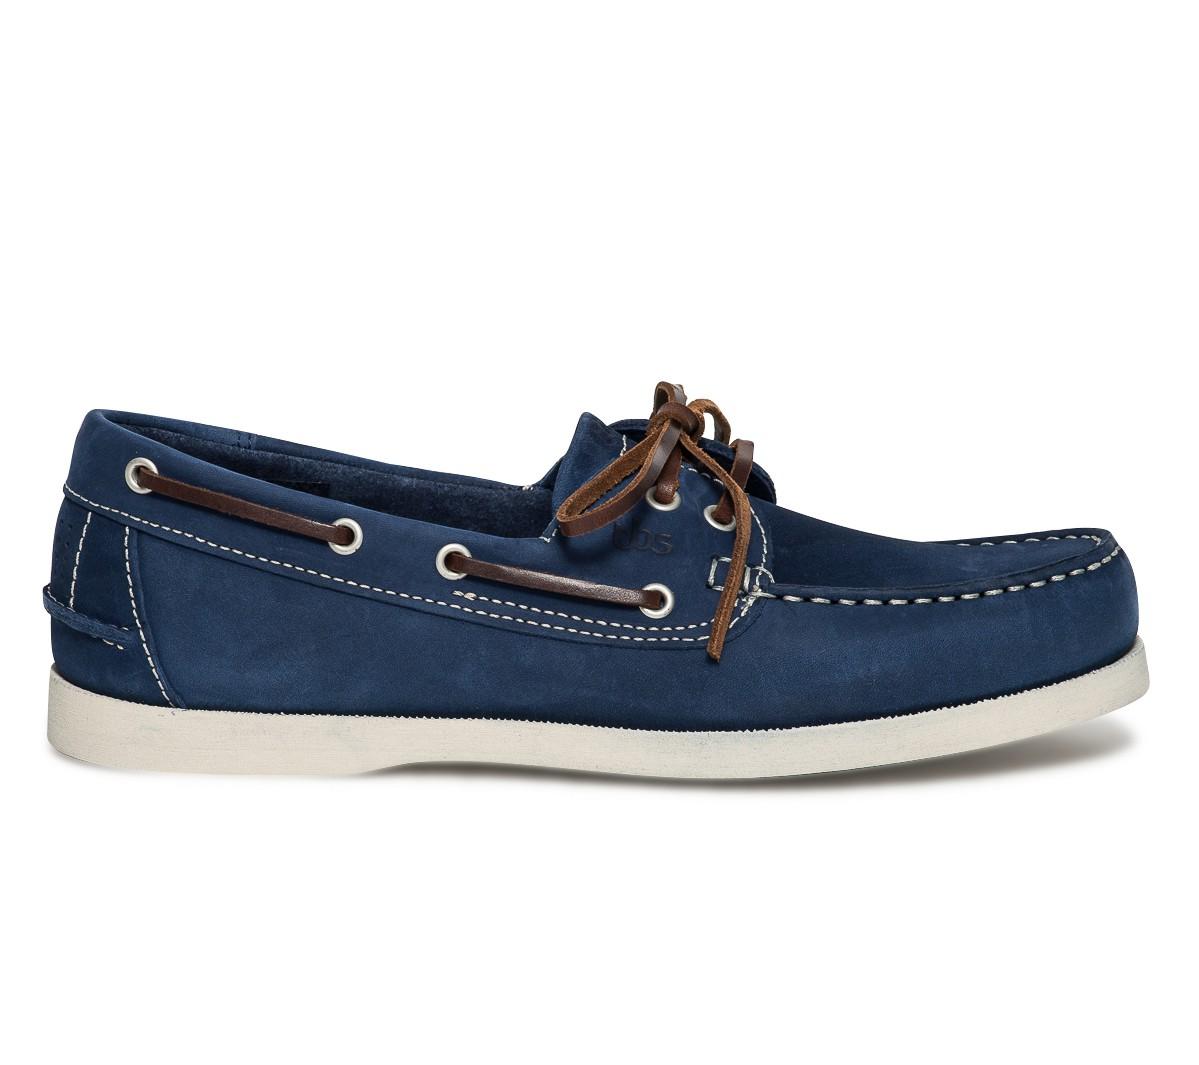 tommy hilfiger denim chaussures bateaux en cuir su d bleu marine ventes pas. Black Bedroom Furniture Sets. Home Design Ideas